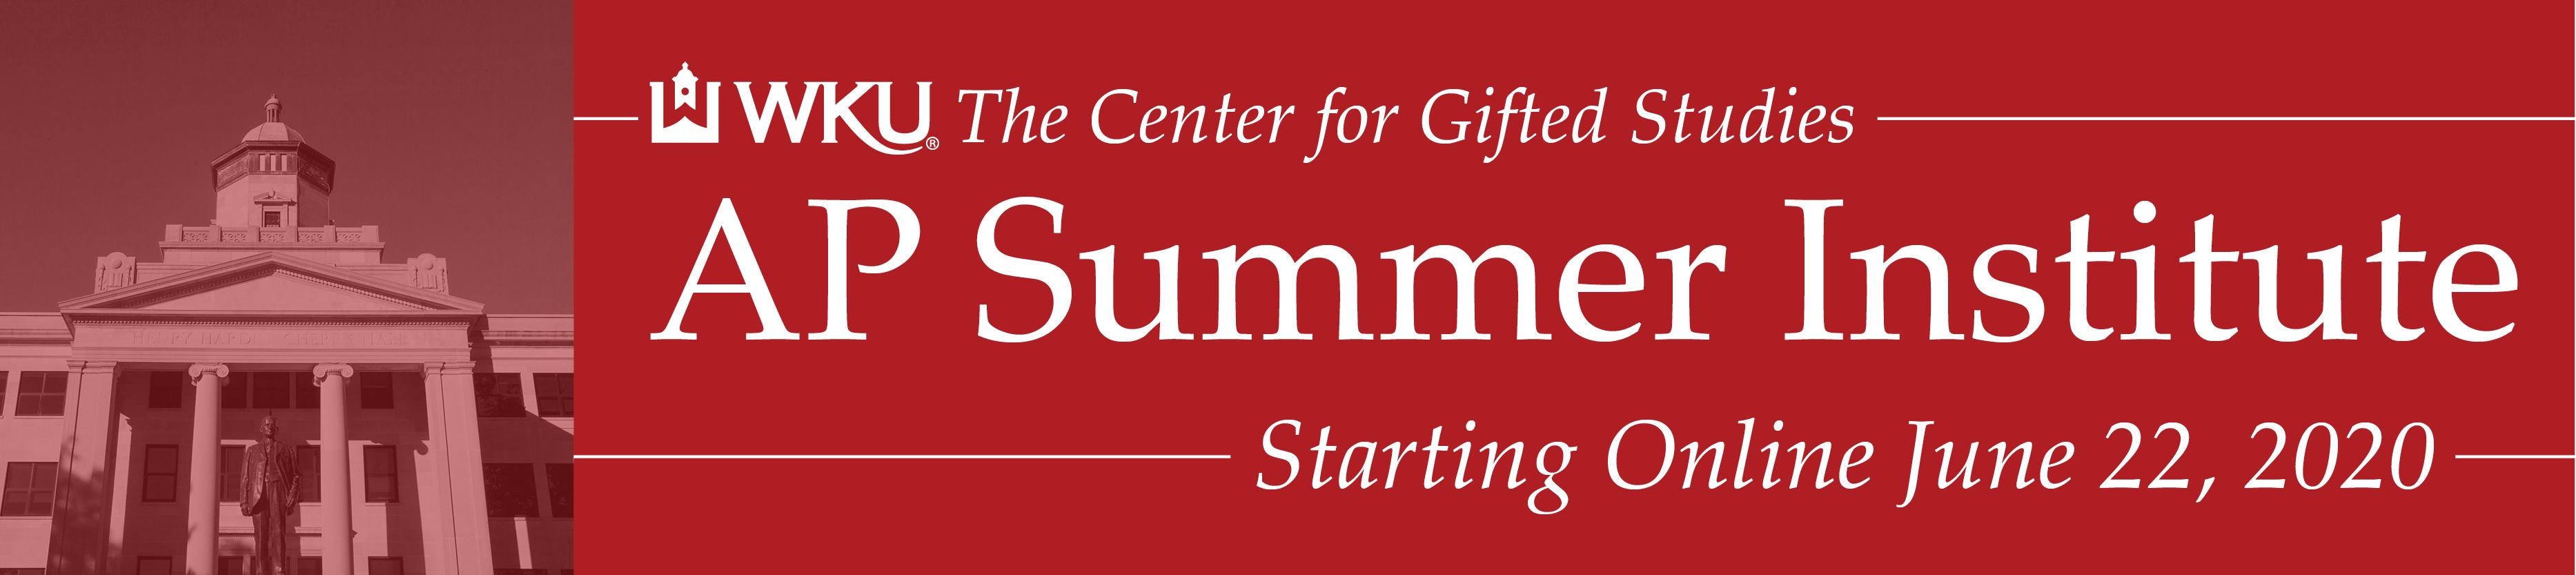 Western Kentucky University AP Summer Institute 2020 Online Week 1